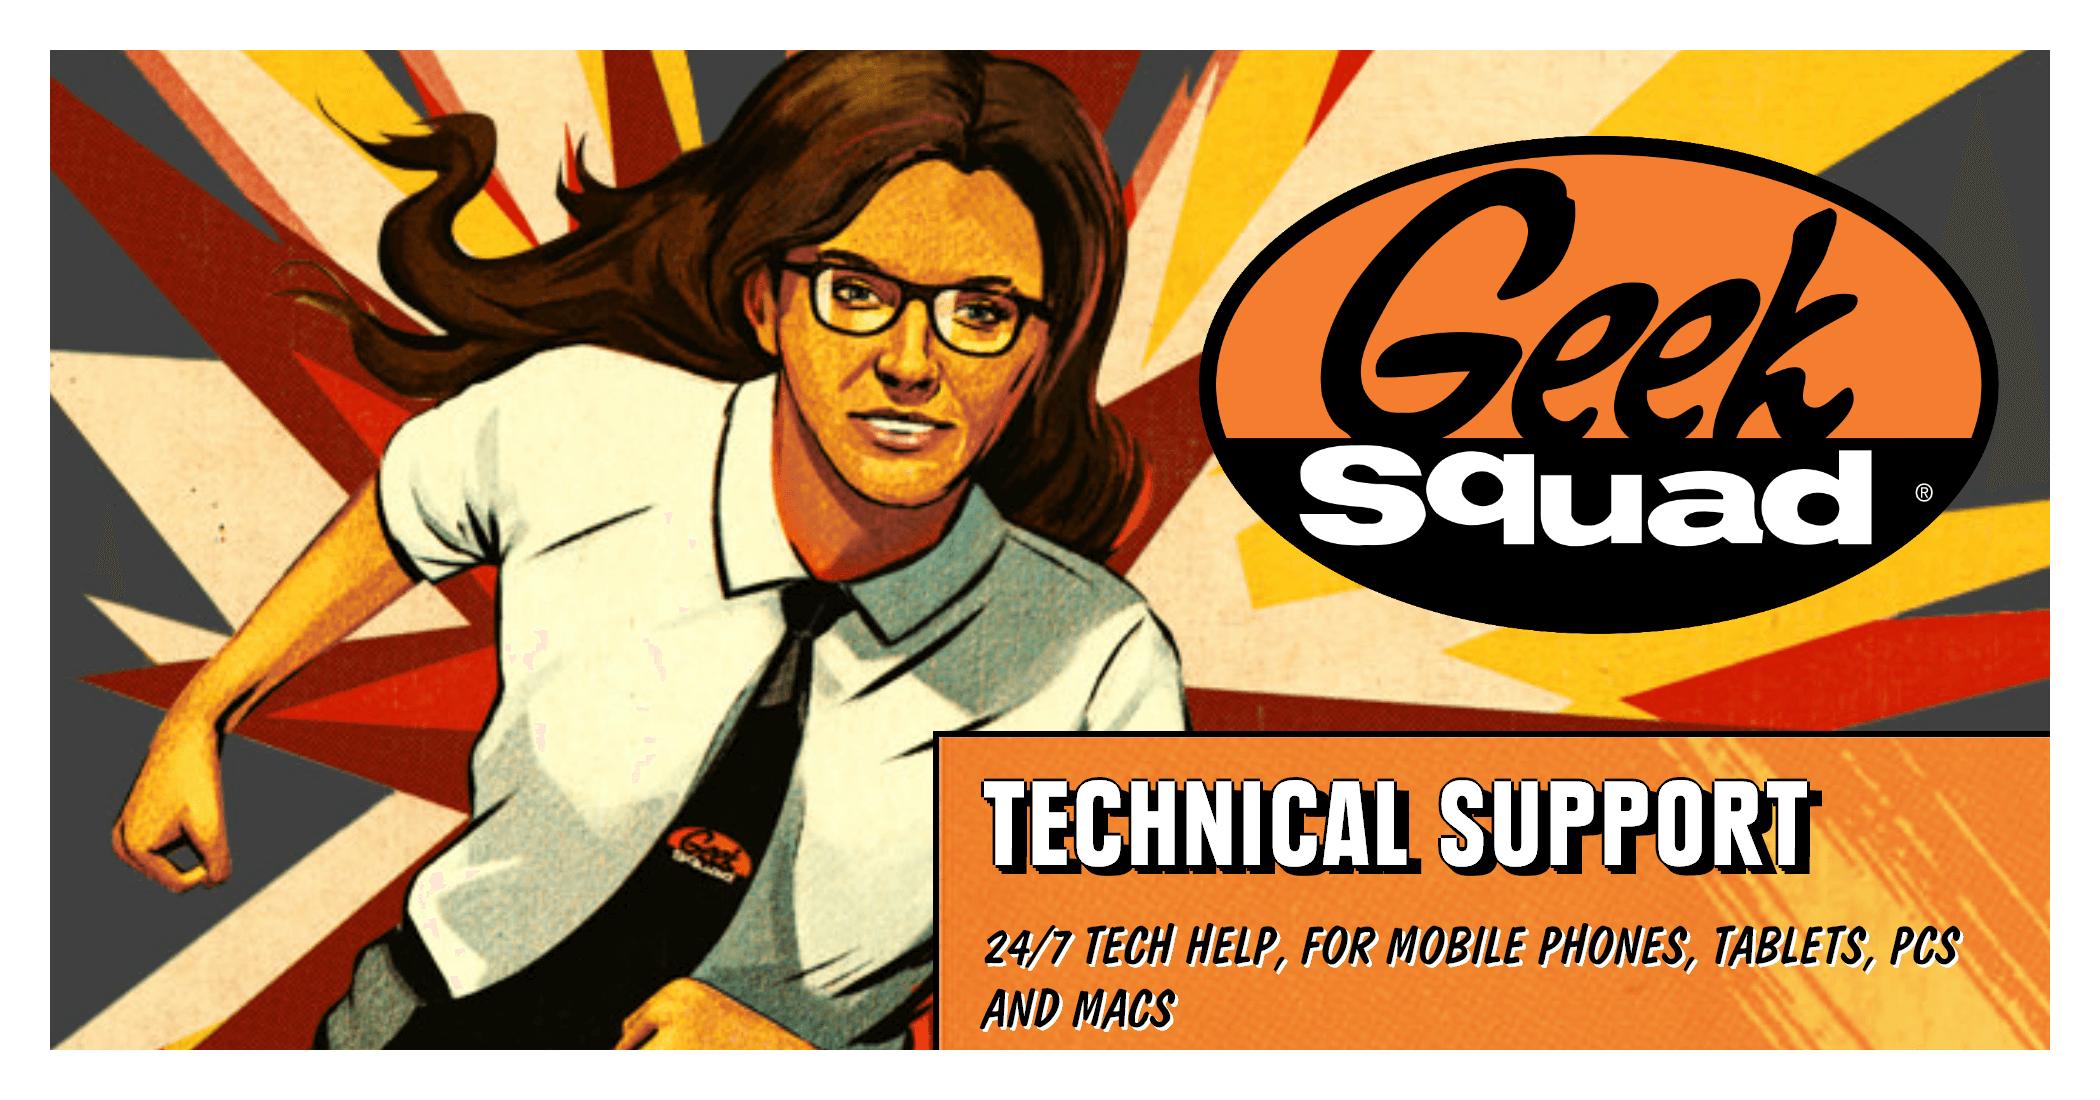 geek squad phone insurance photo - 1